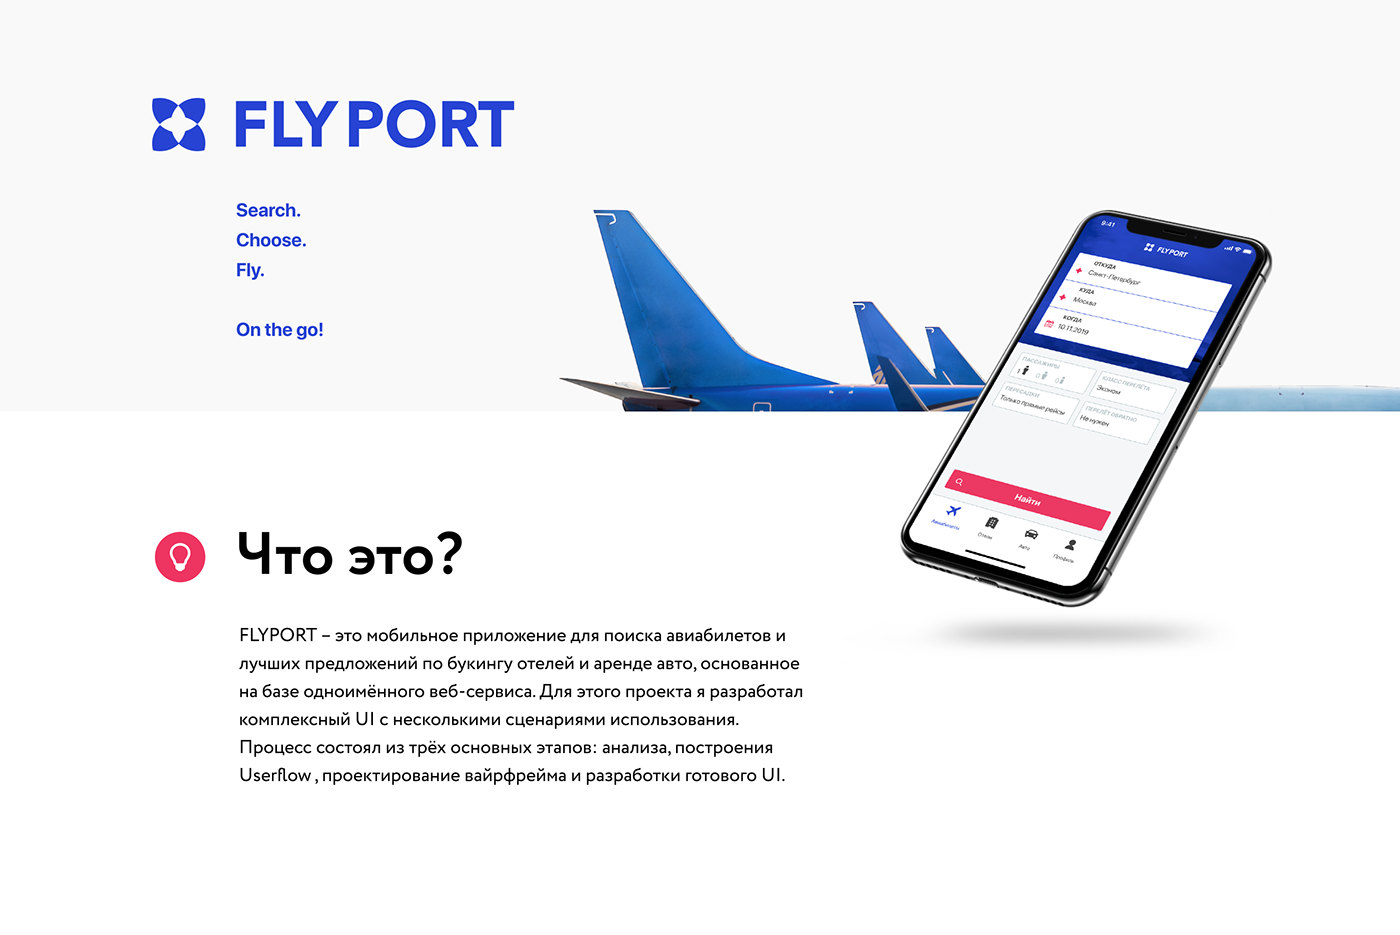 Image may contain: screenshot and airplane